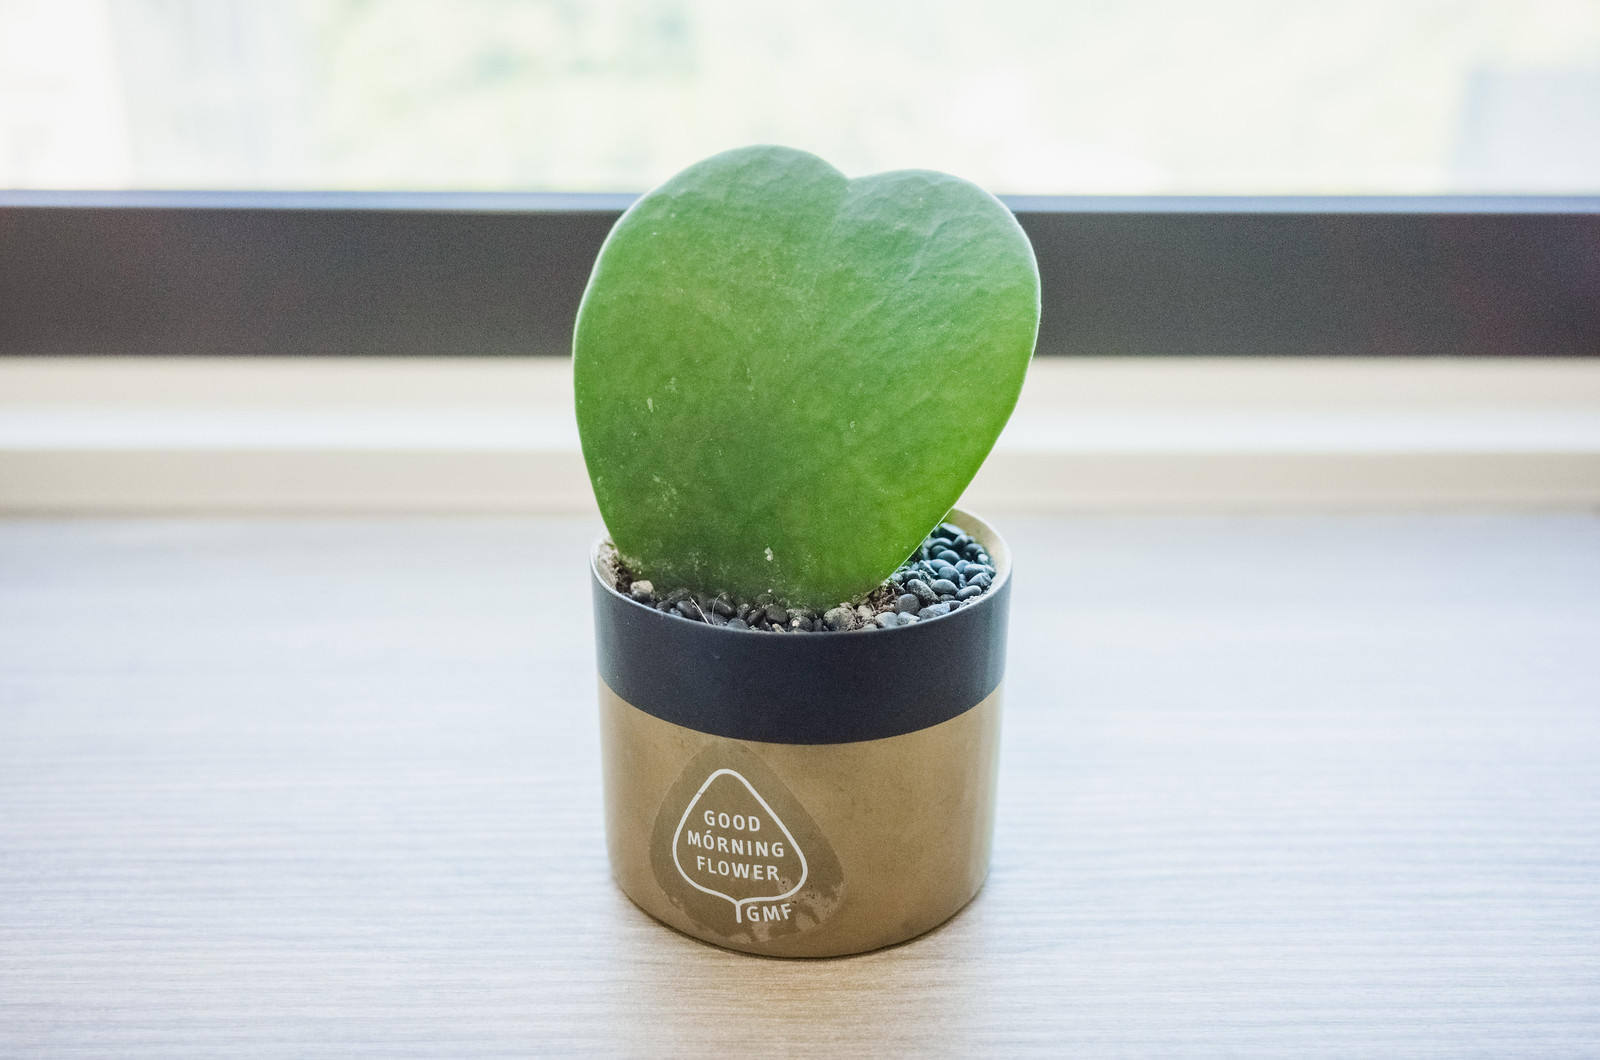 心葉球蘭(Hoya kerrii)